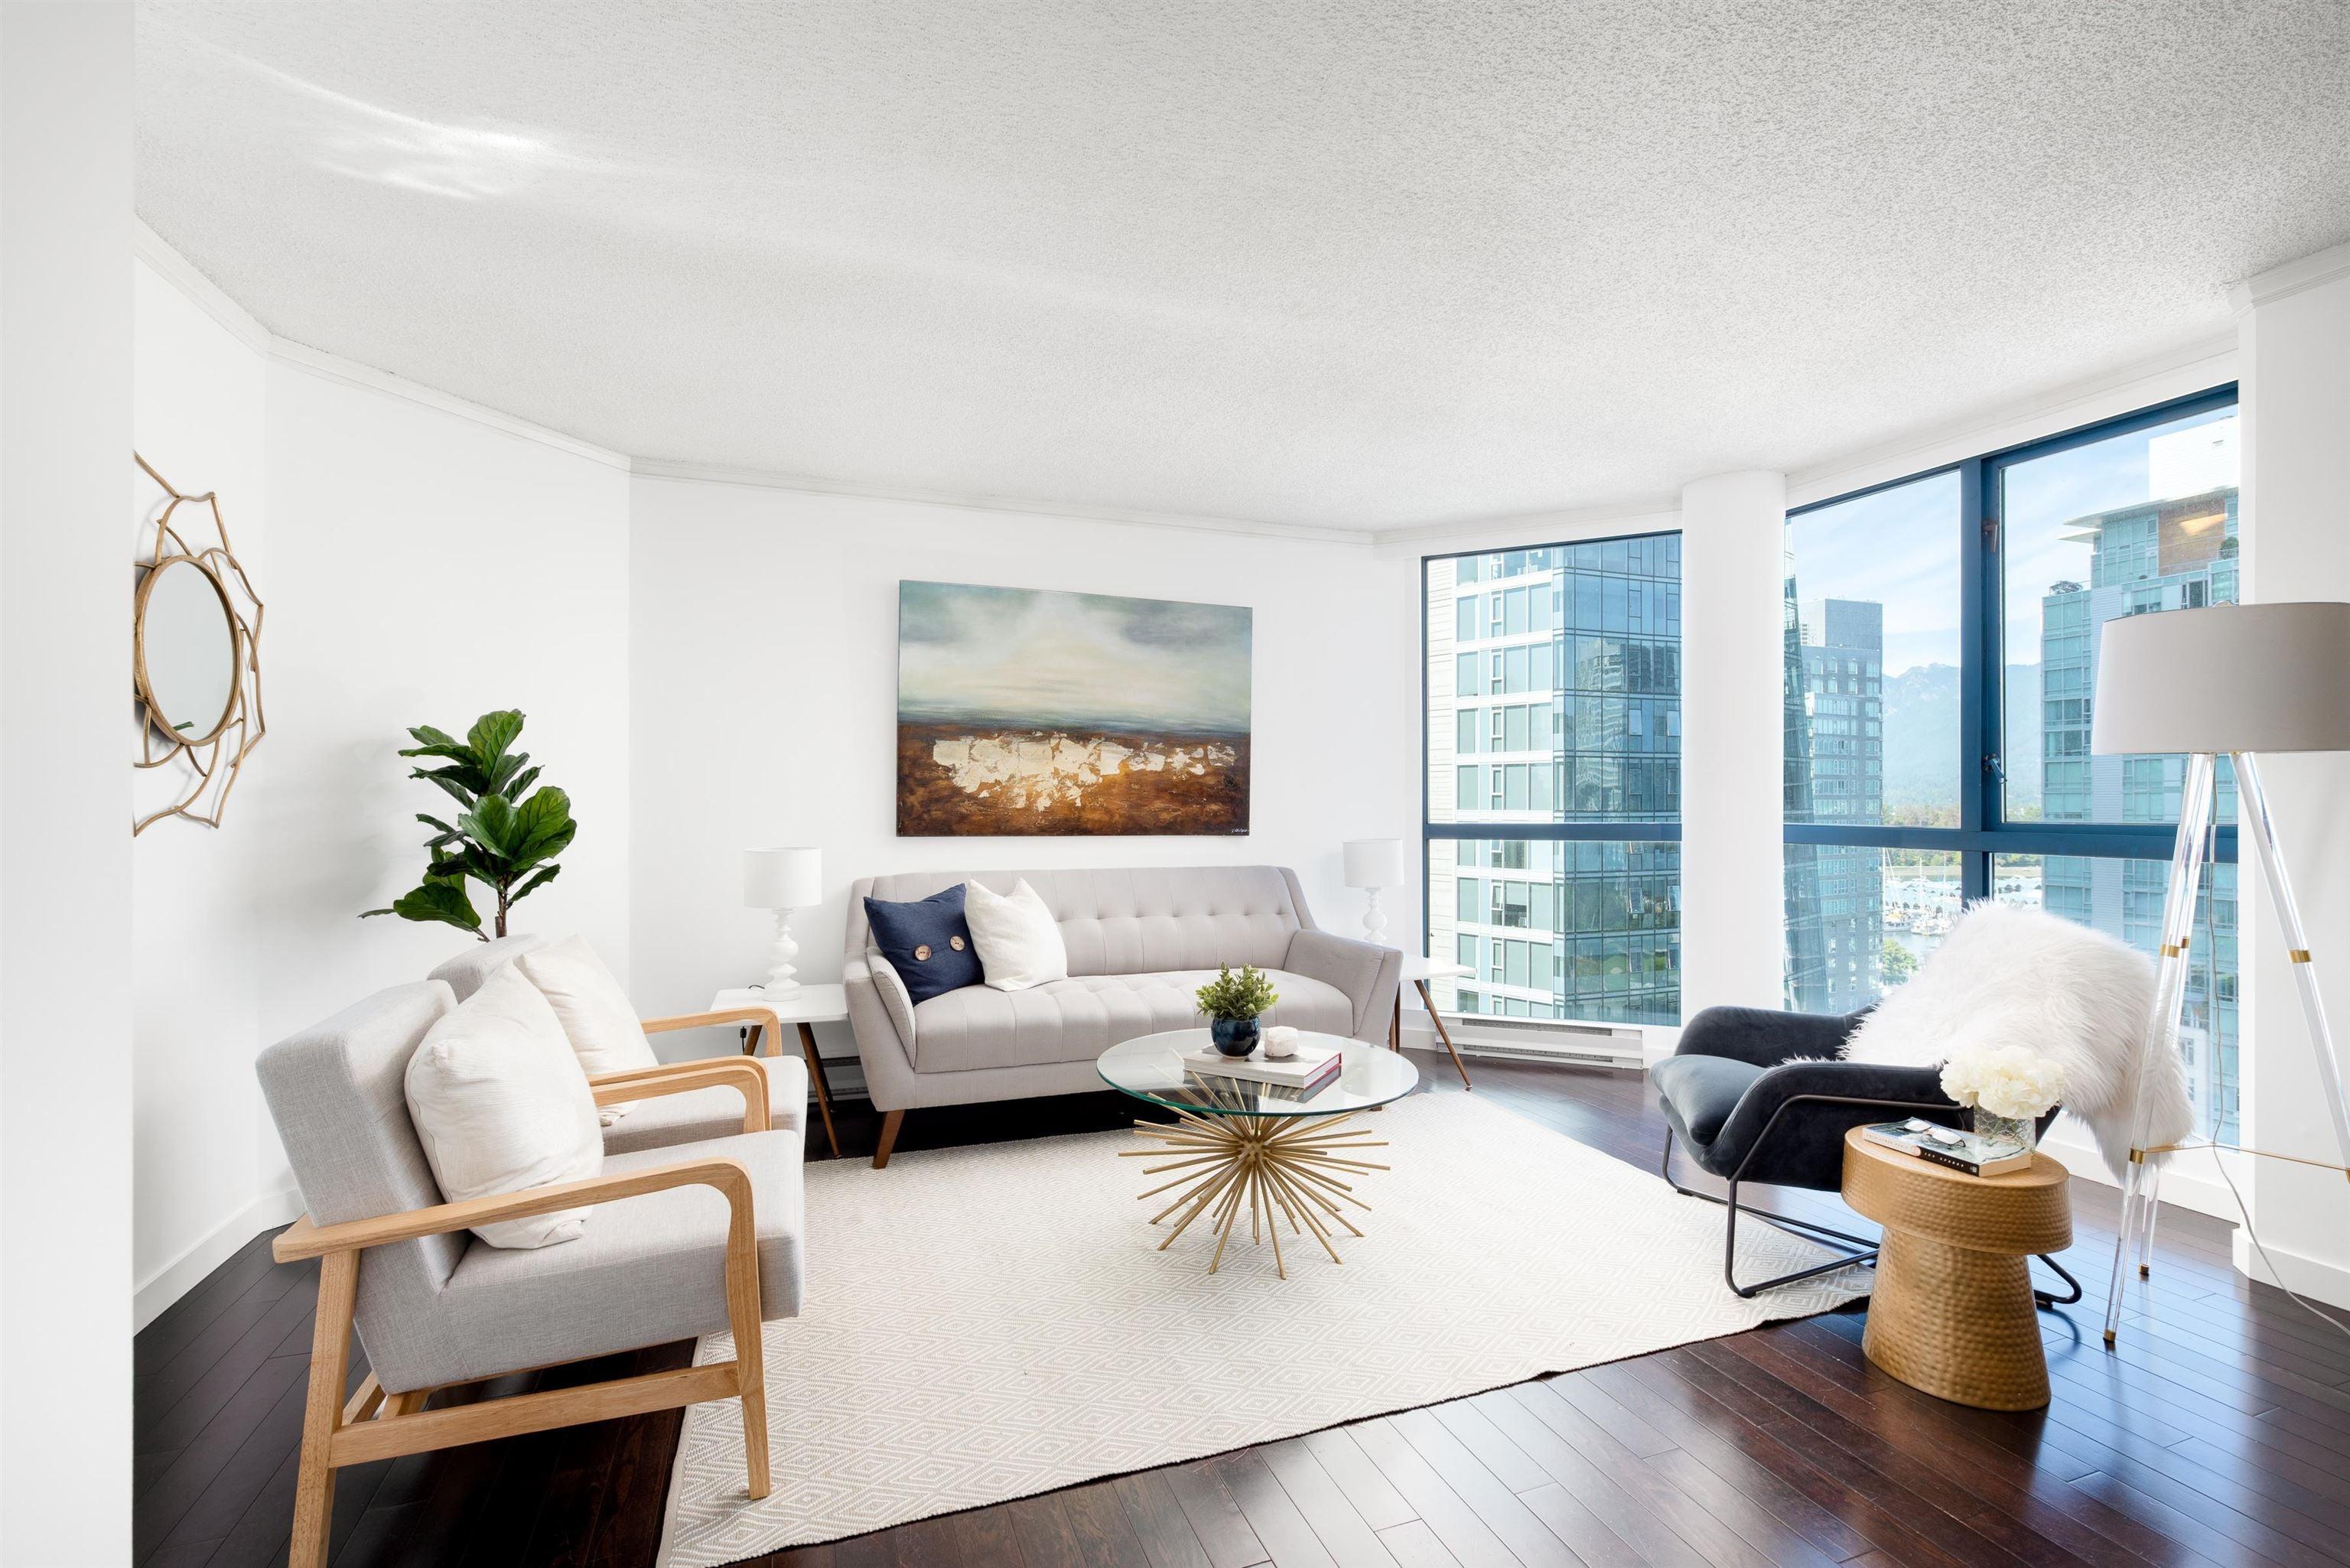 1101 1415 W GEORGIA STREET - Coal Harbour Apartment/Condo for sale, 2 Bedrooms (R2627289) - #1